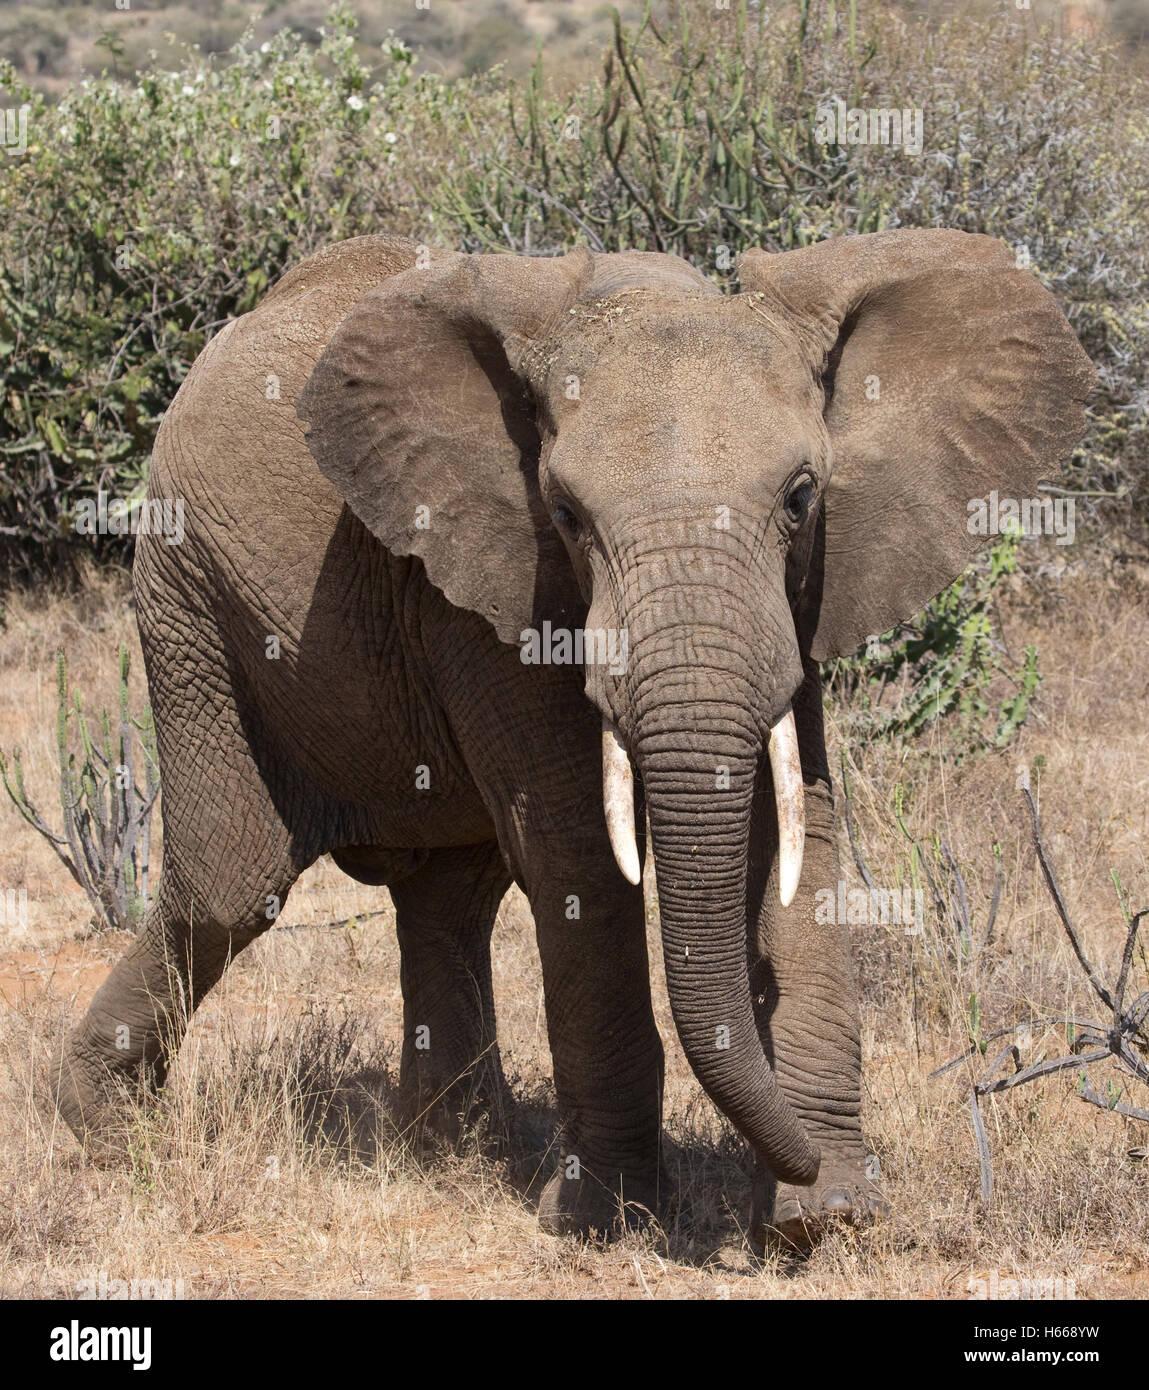 Ein afrikanischer Elefant droht Laikipia Plateau Grasland Kenia Stockbild